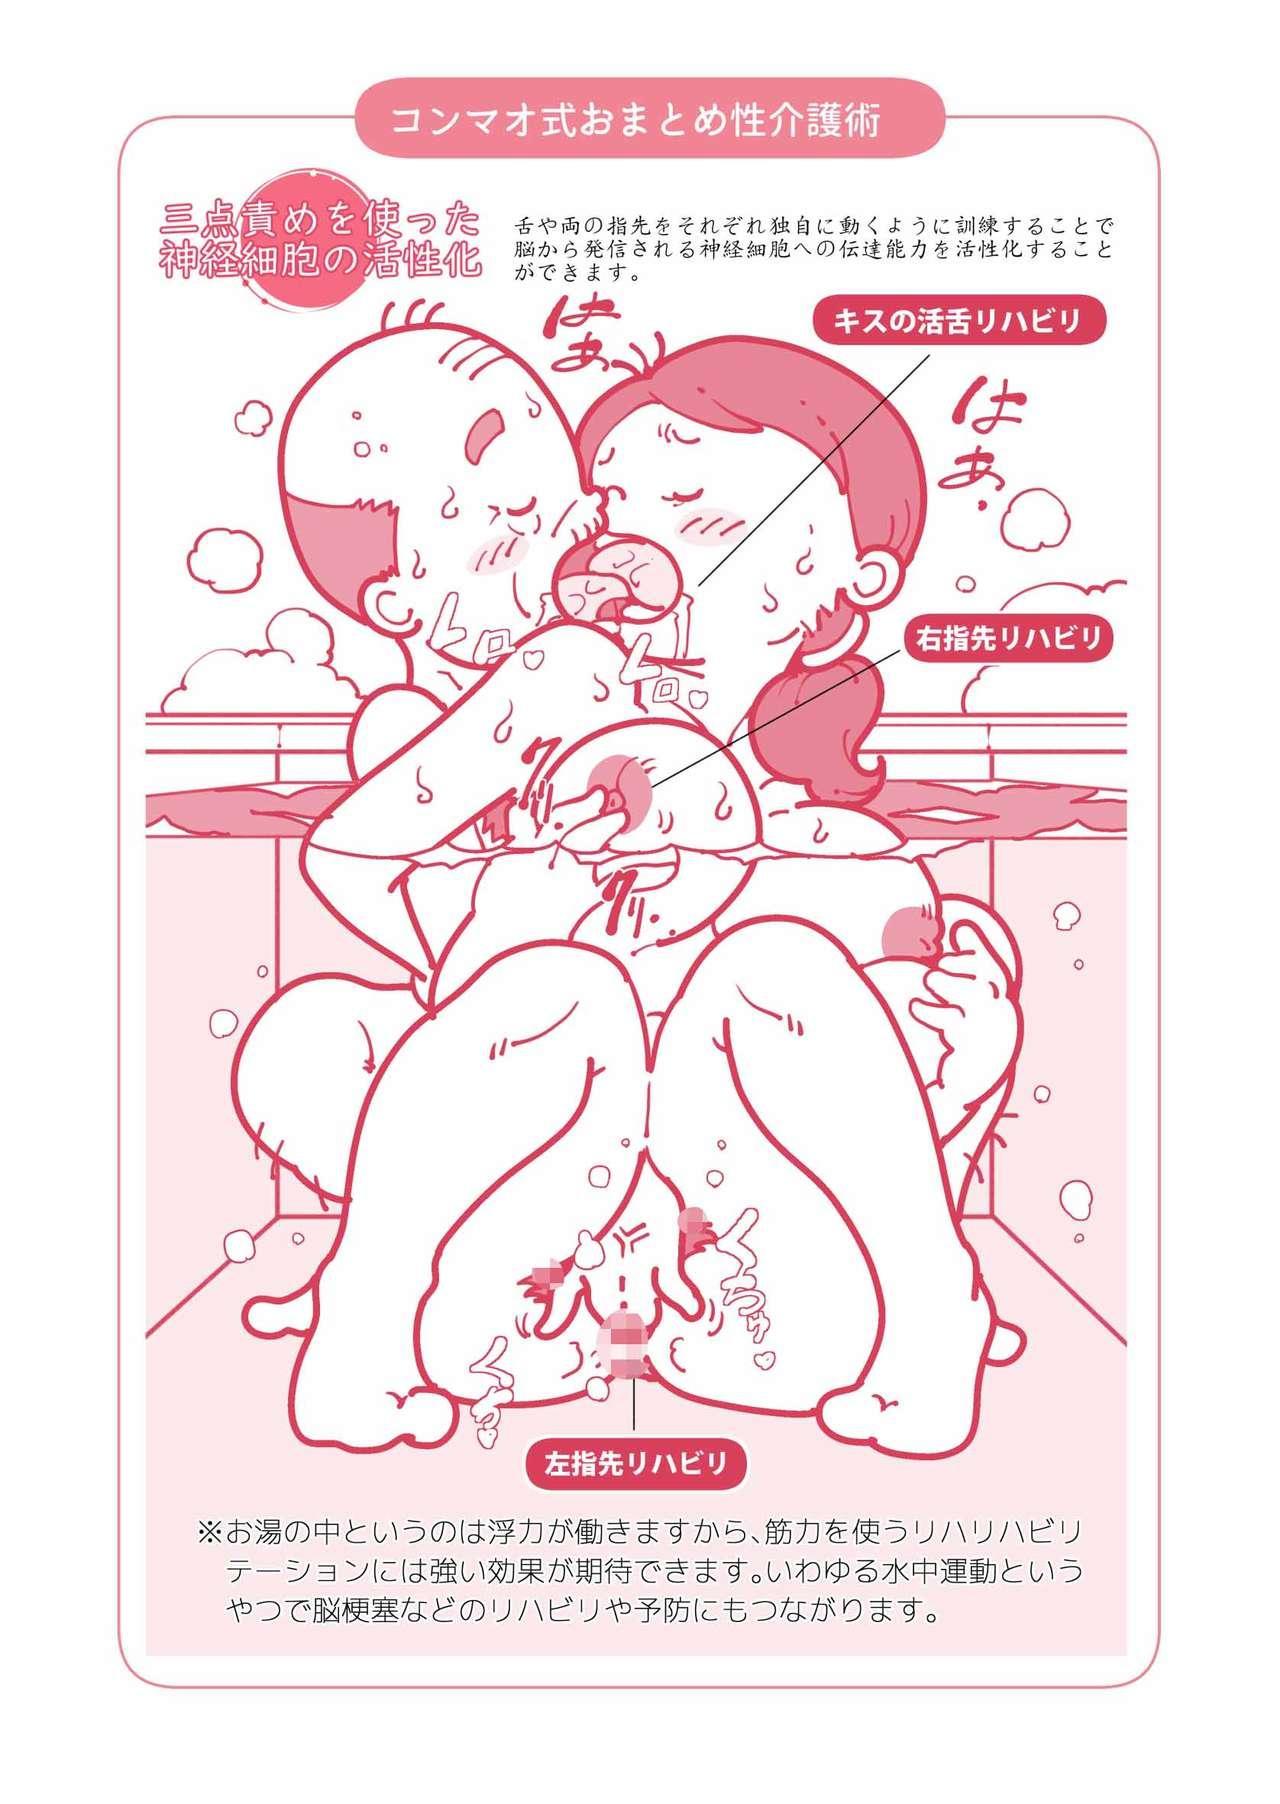 Isogasii Okaasan No Tamuno Sasa Rouzin Seikaigo | Guide for Elderly Sex Health Care to Busy Mom 48